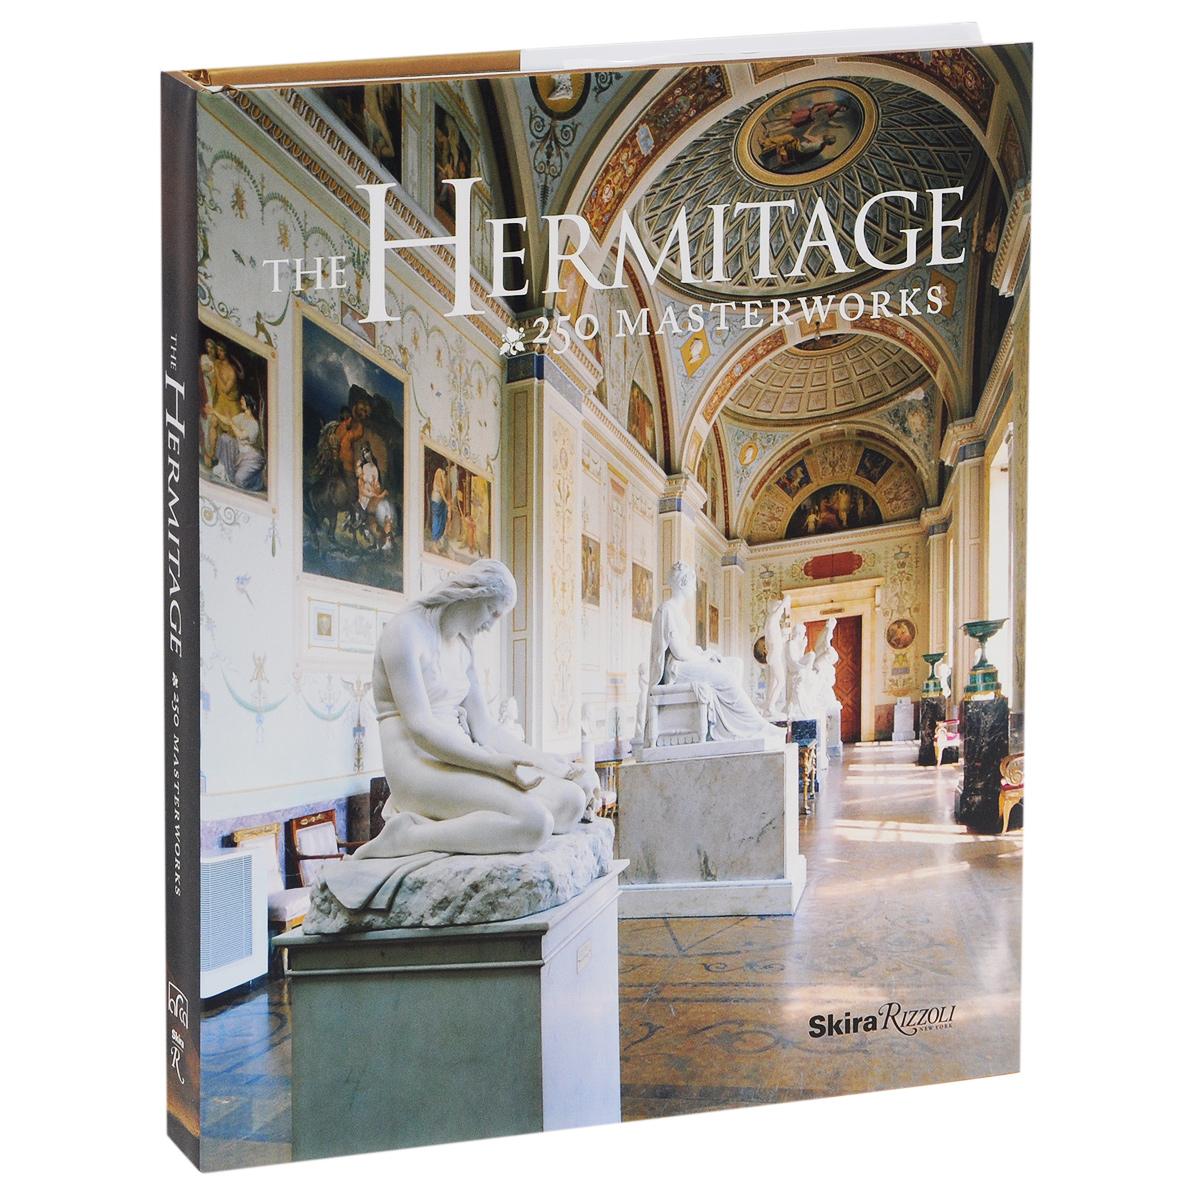 The Hermitage: 250 Masterworks this globalizing world